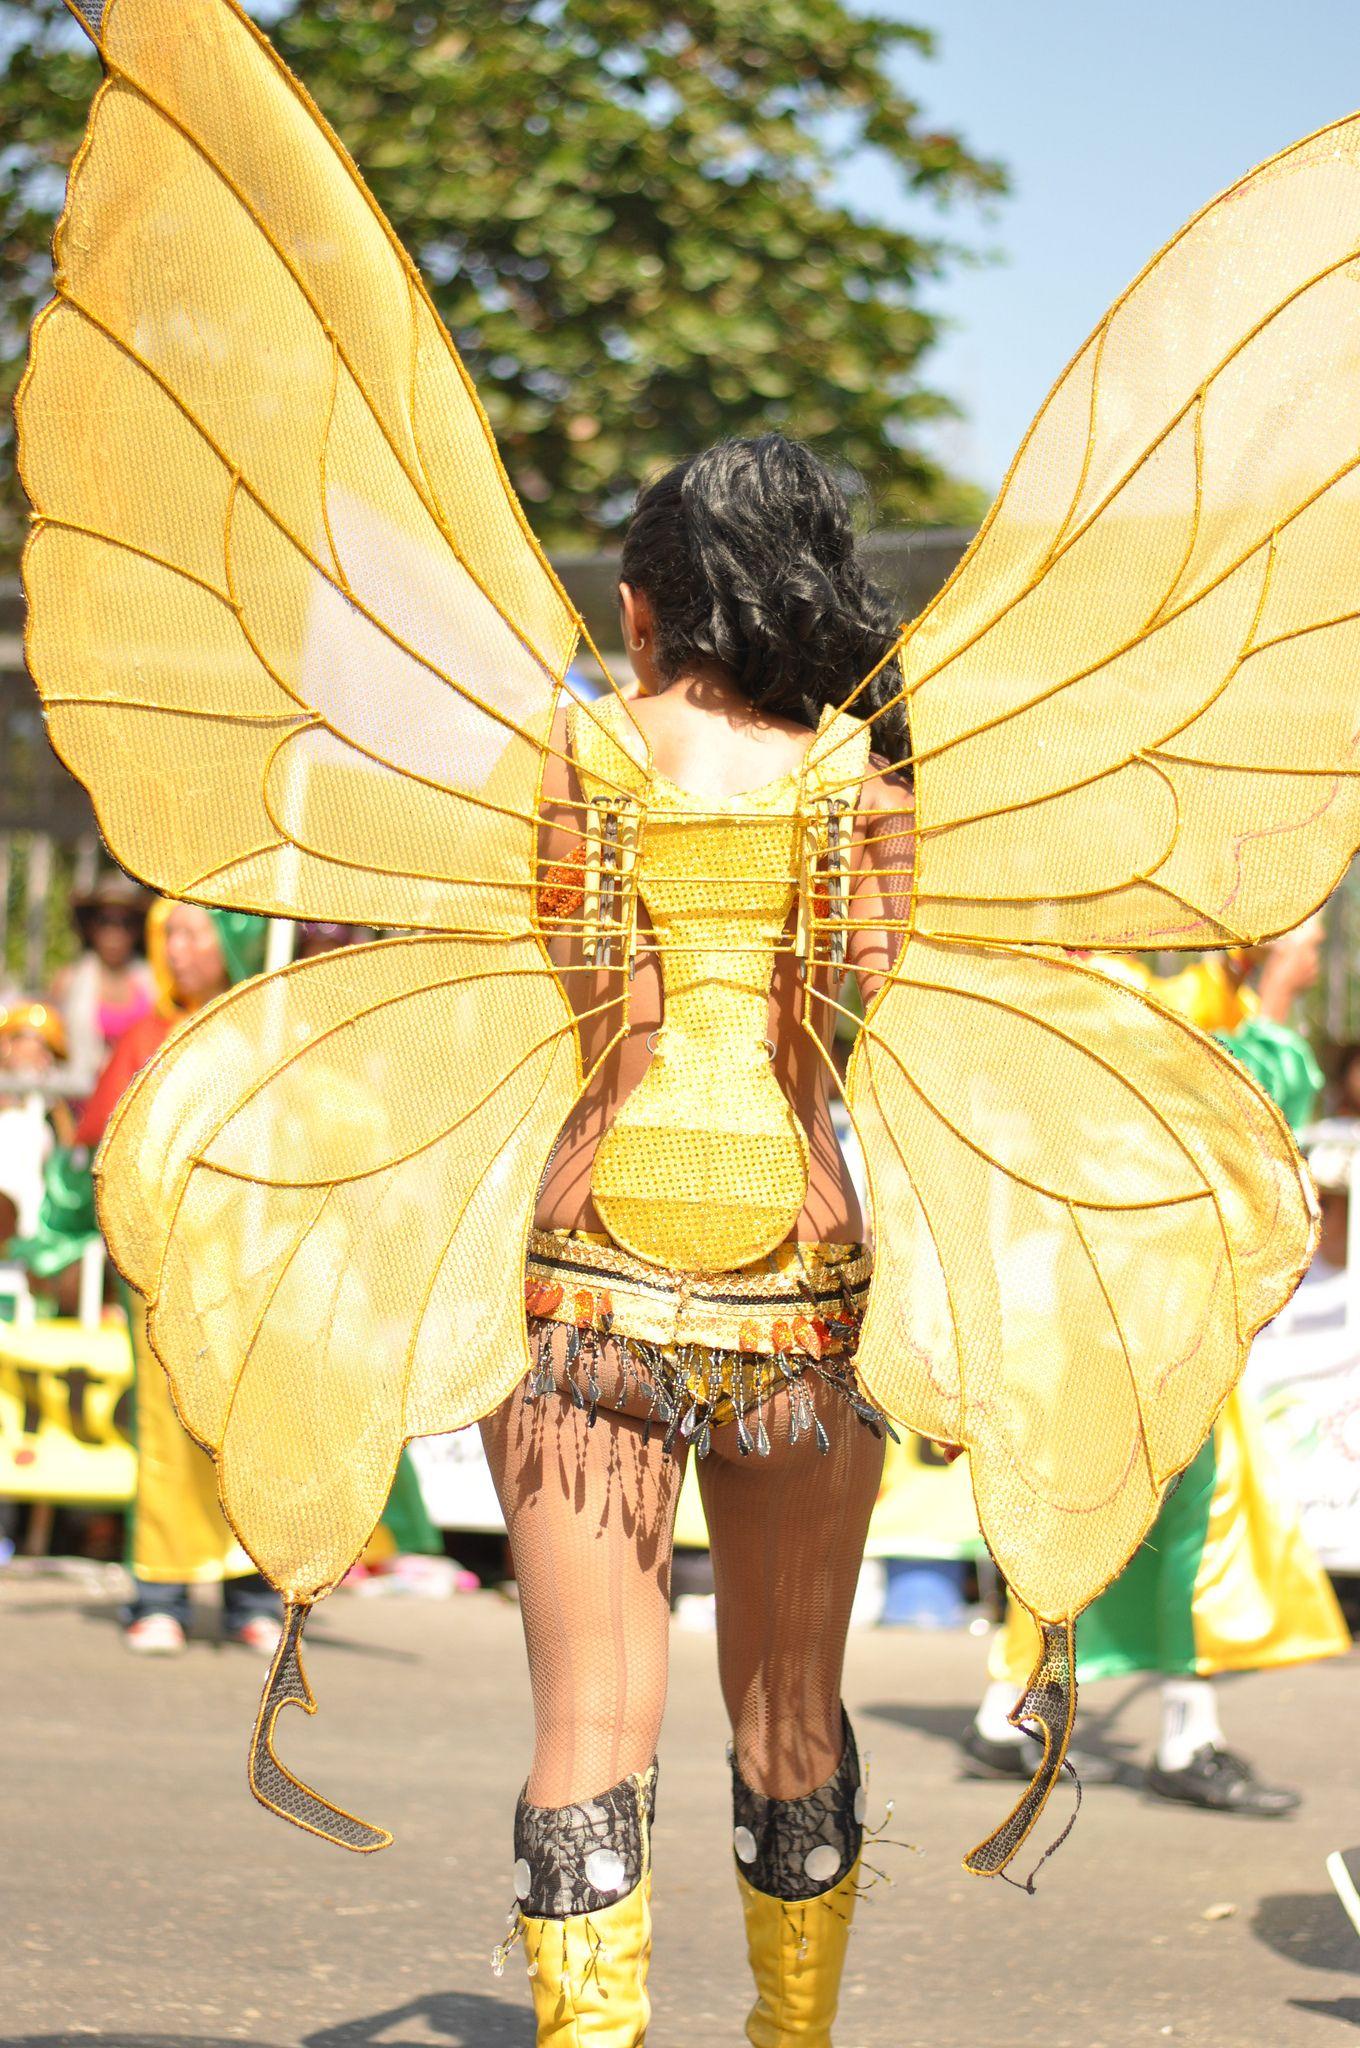 Carnaval de Barranquilla | Theatrical costumes | Costumes ... - photo#17